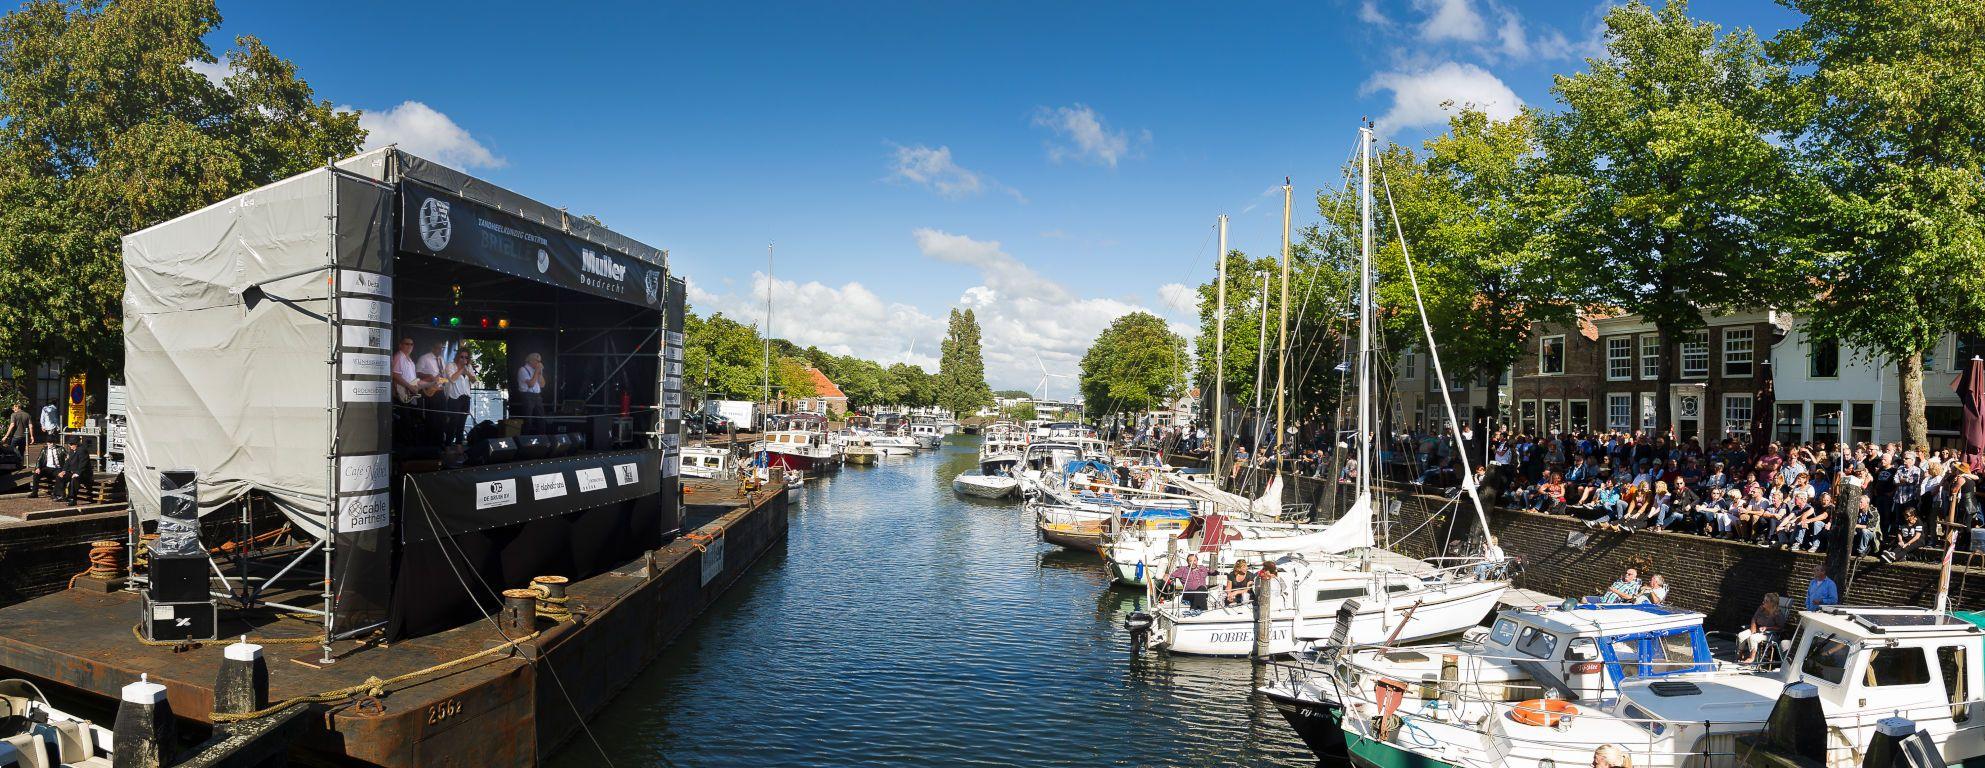 cultuur Brielle Voorne-Putten nabij Rotterdam